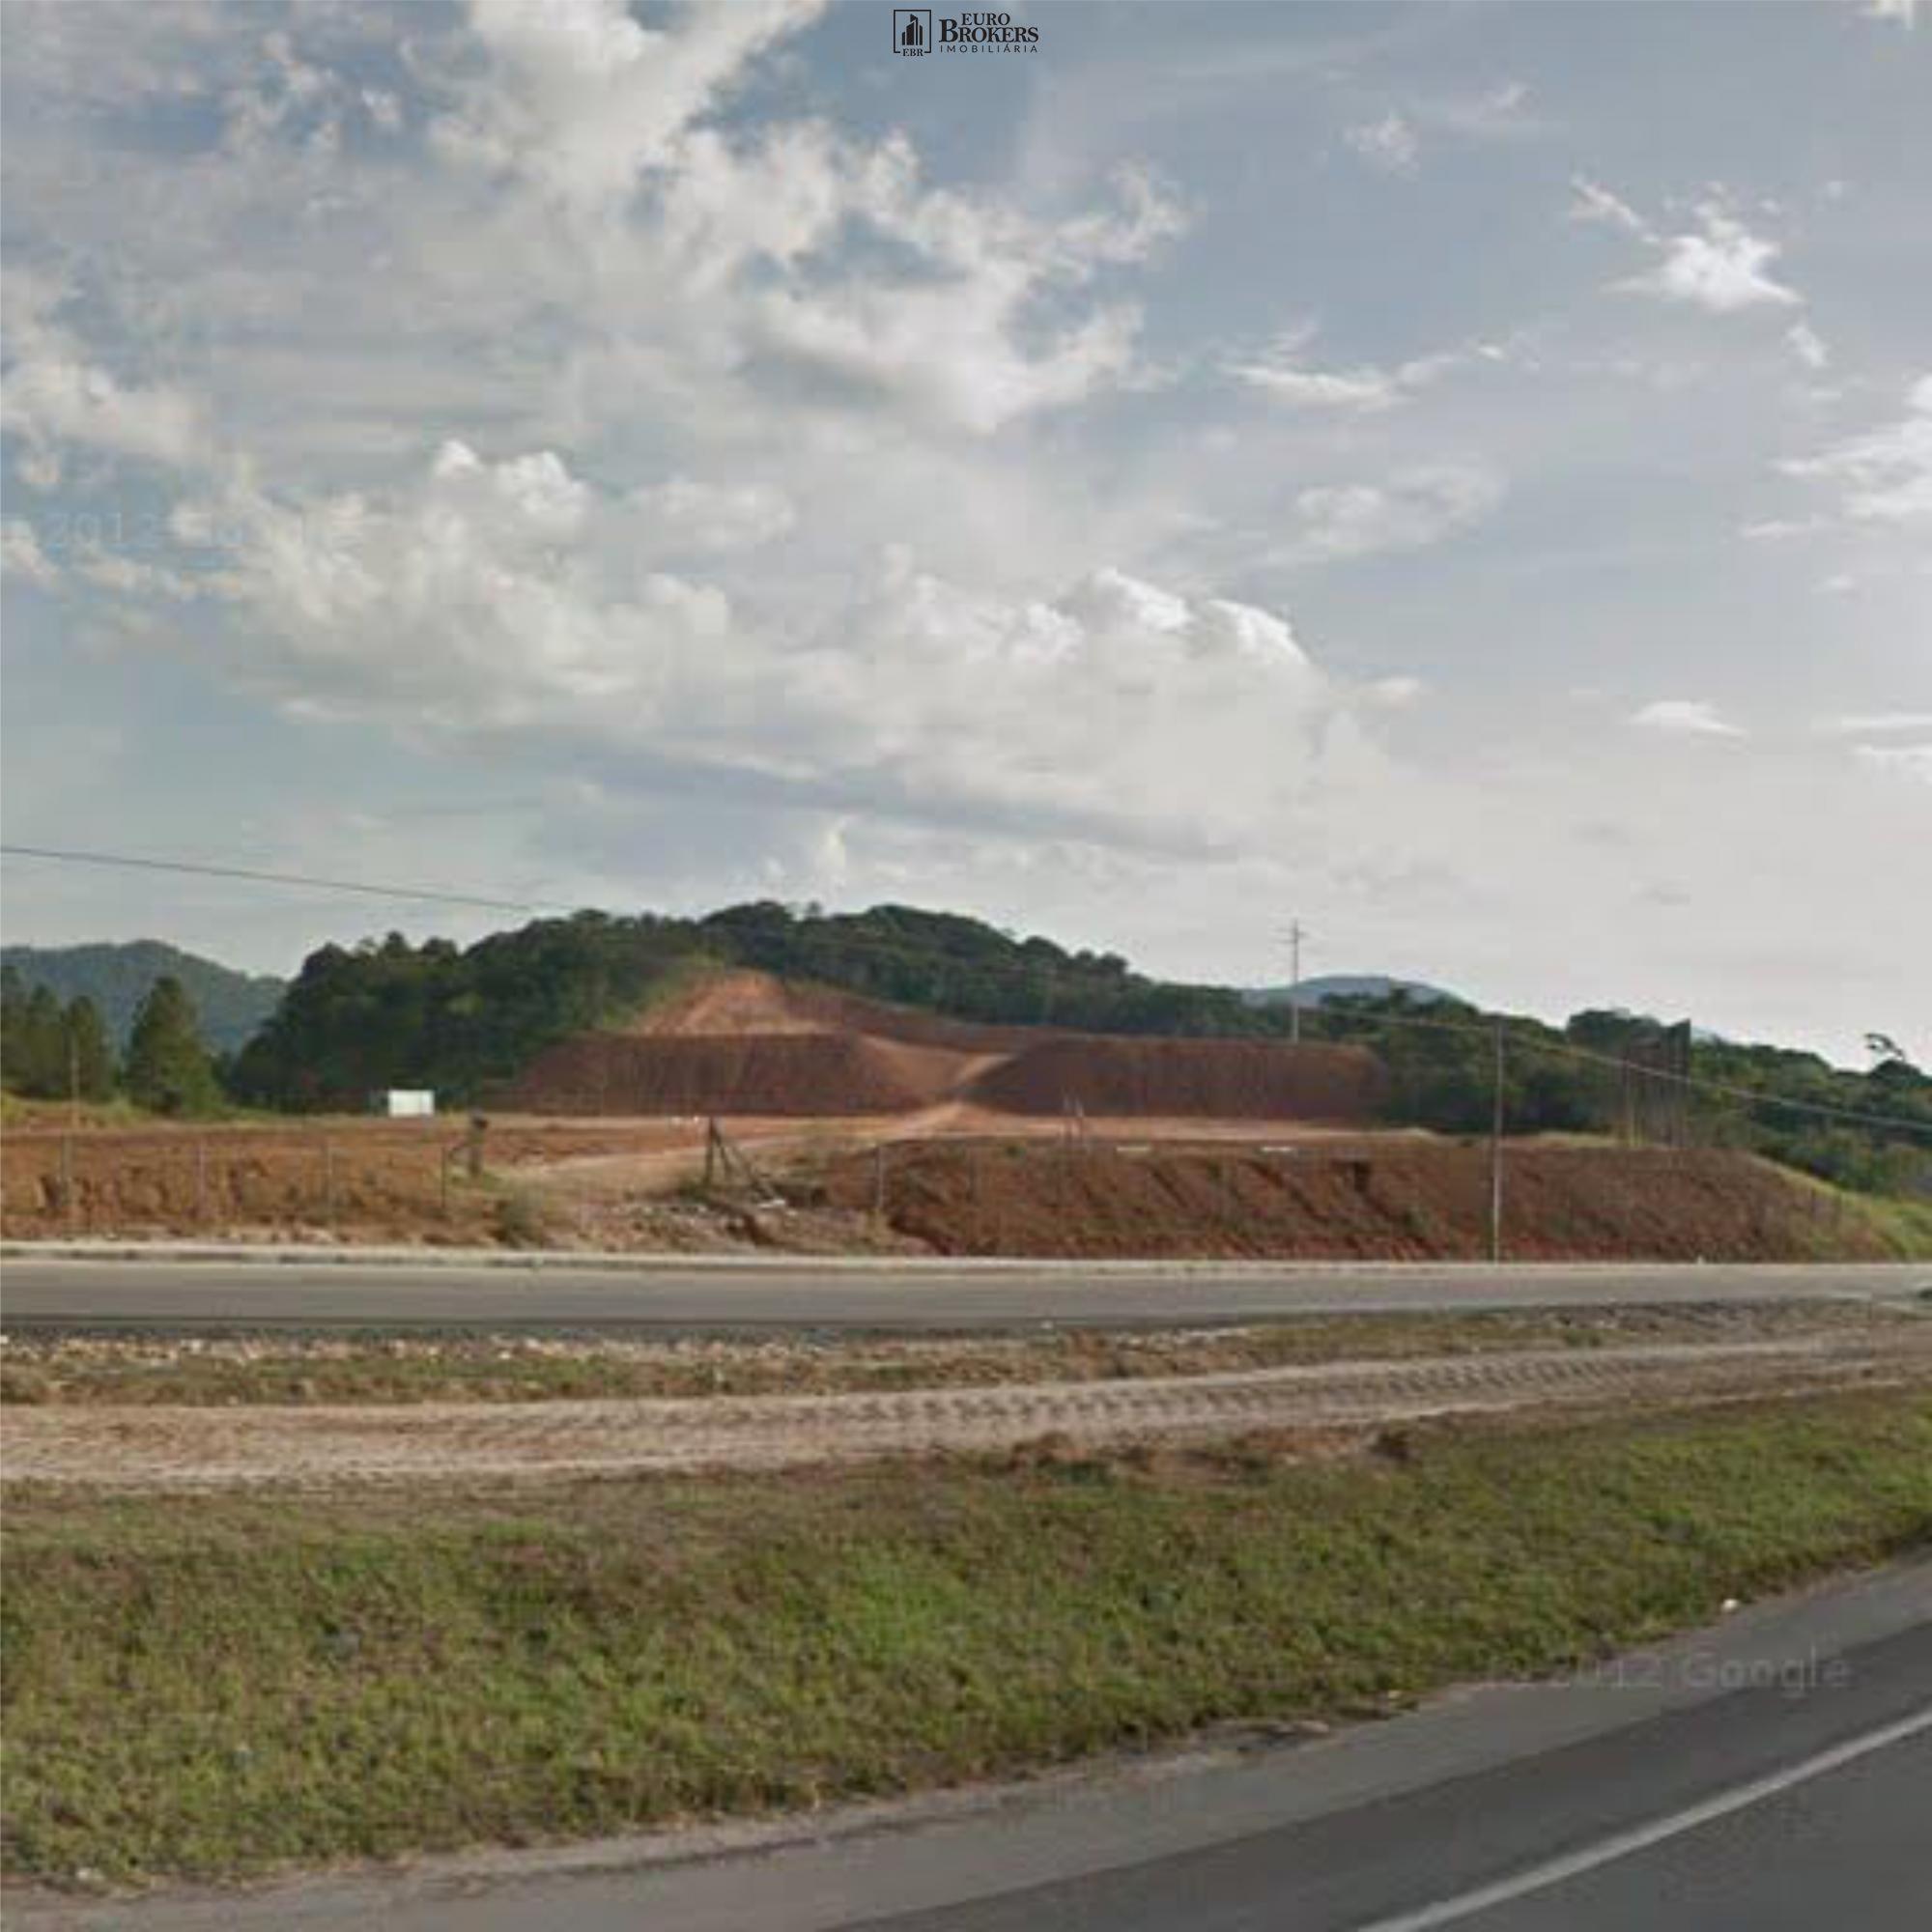 Terreno/Lote à venda  no Várzea do Ranchinho - Camboriú, SC. Imóveis